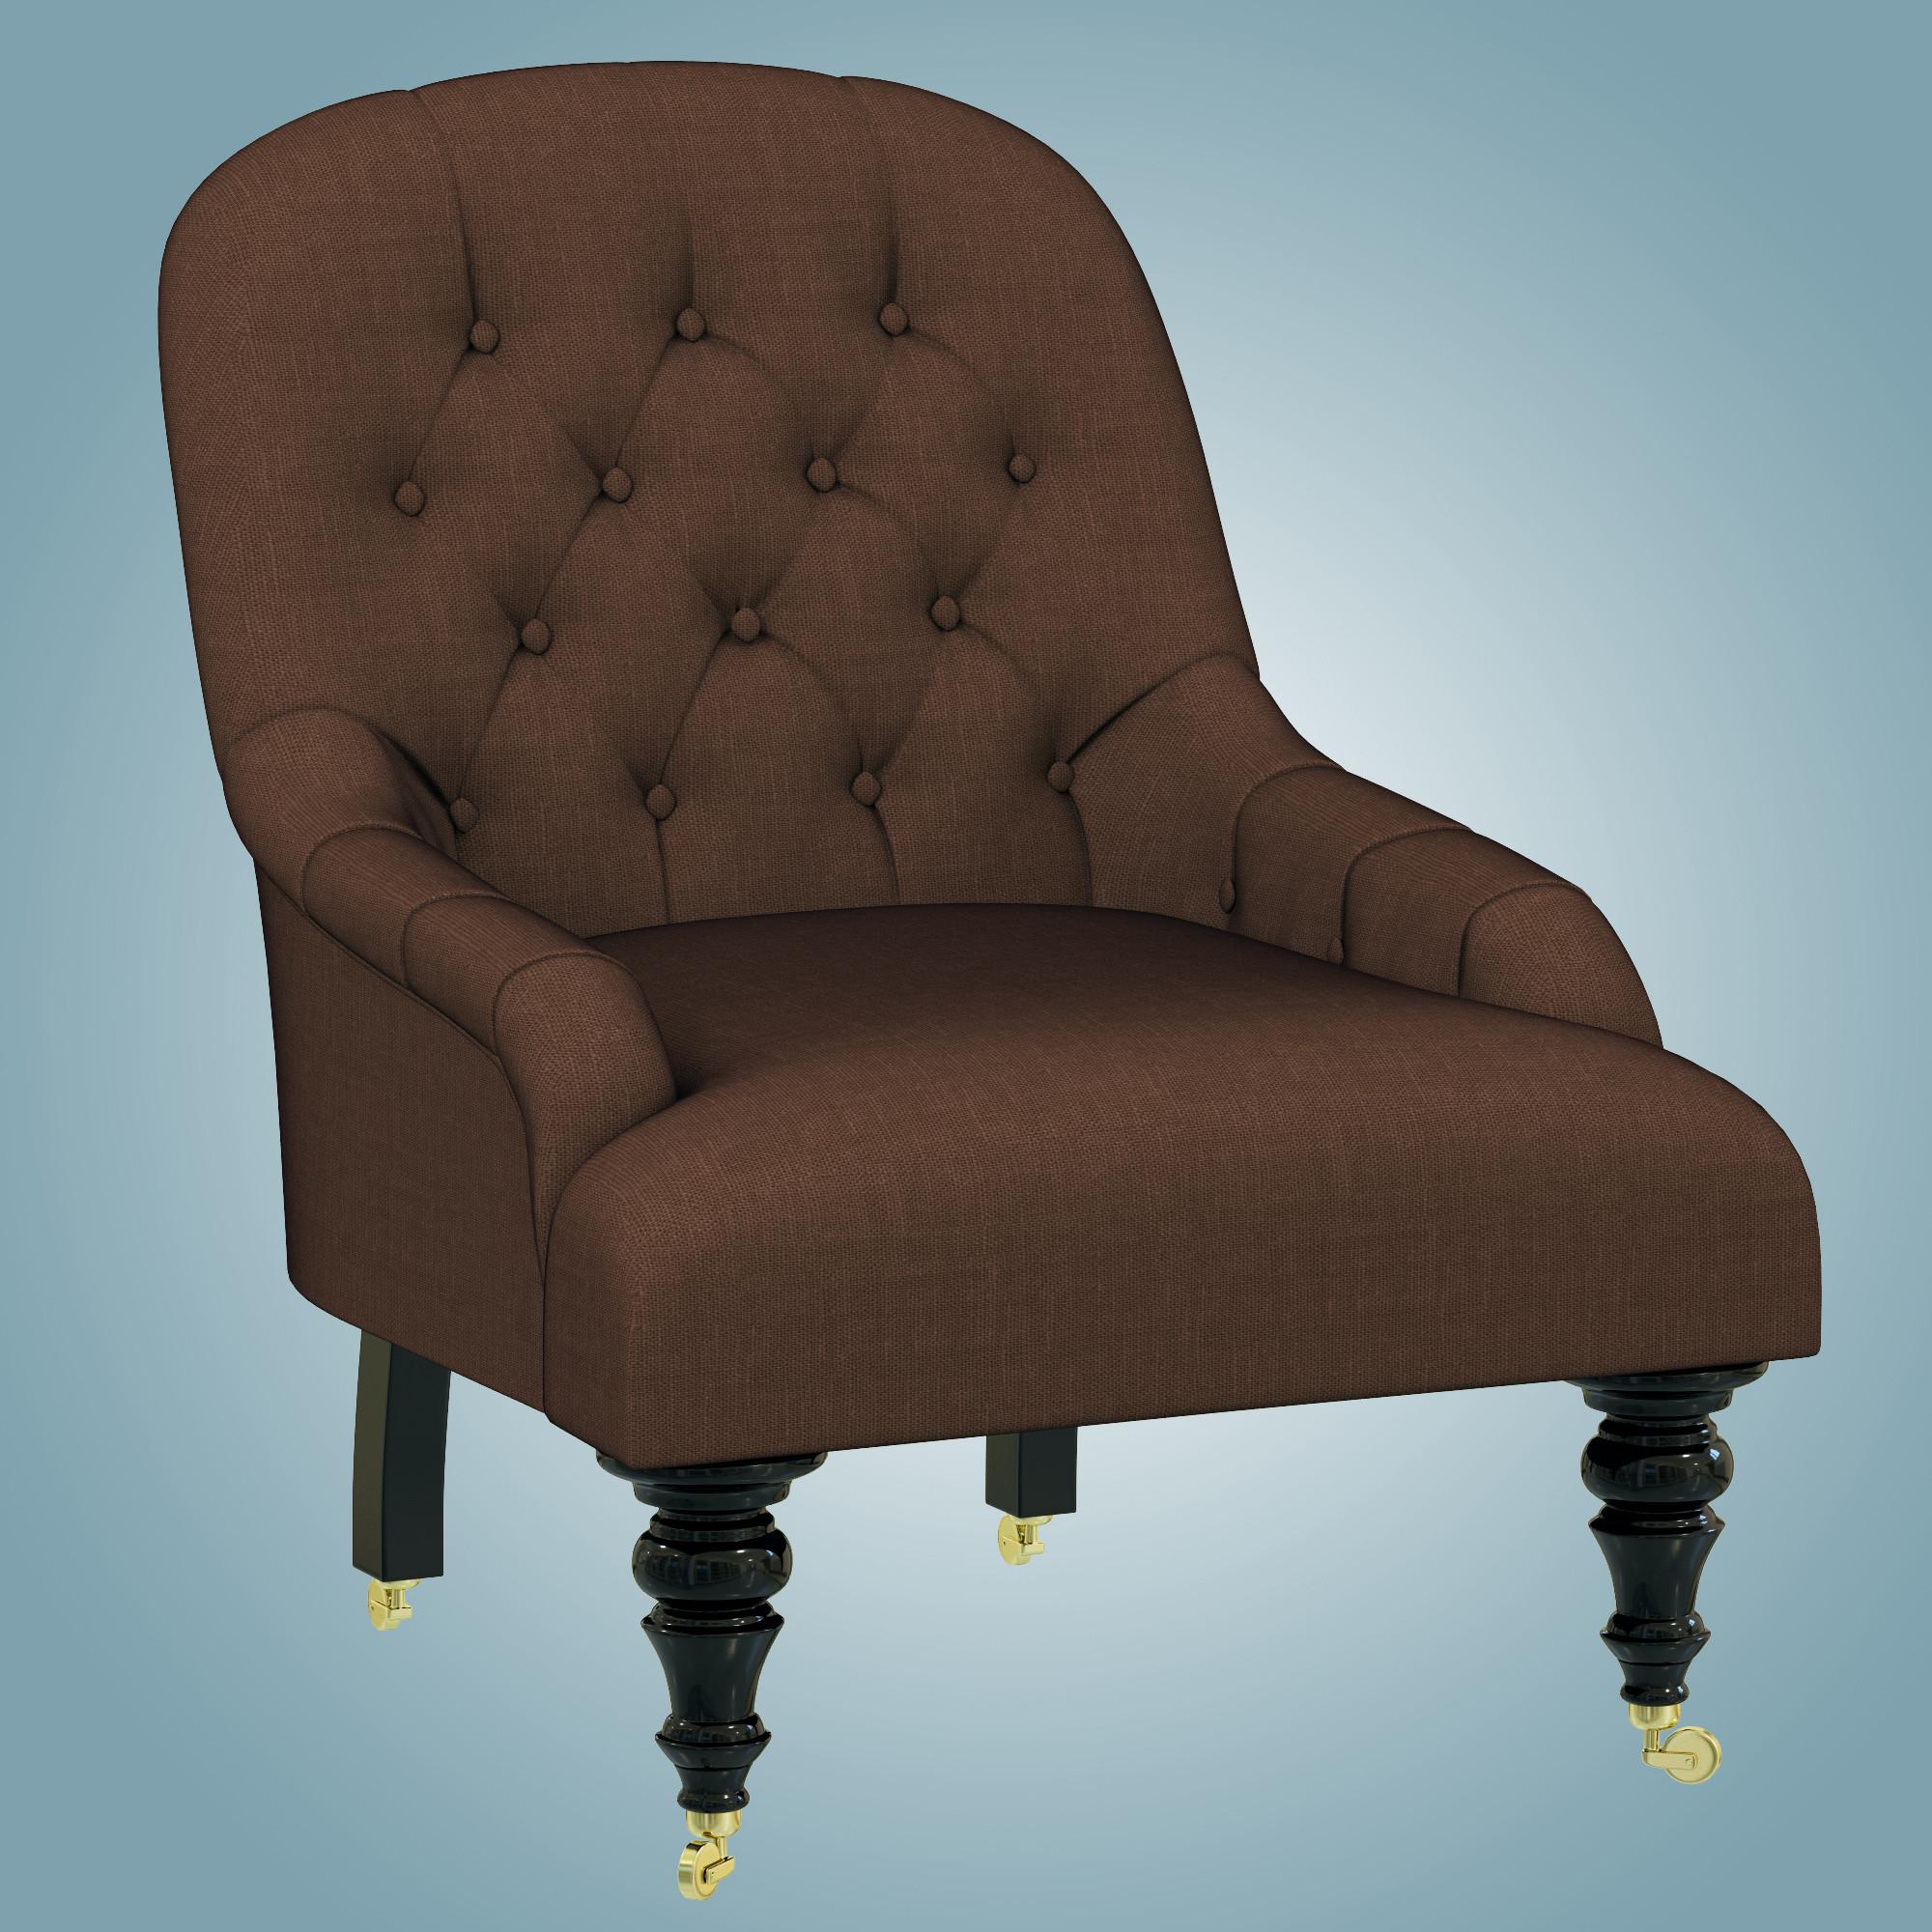 George Smith C024 Eve Chair2first.jpg